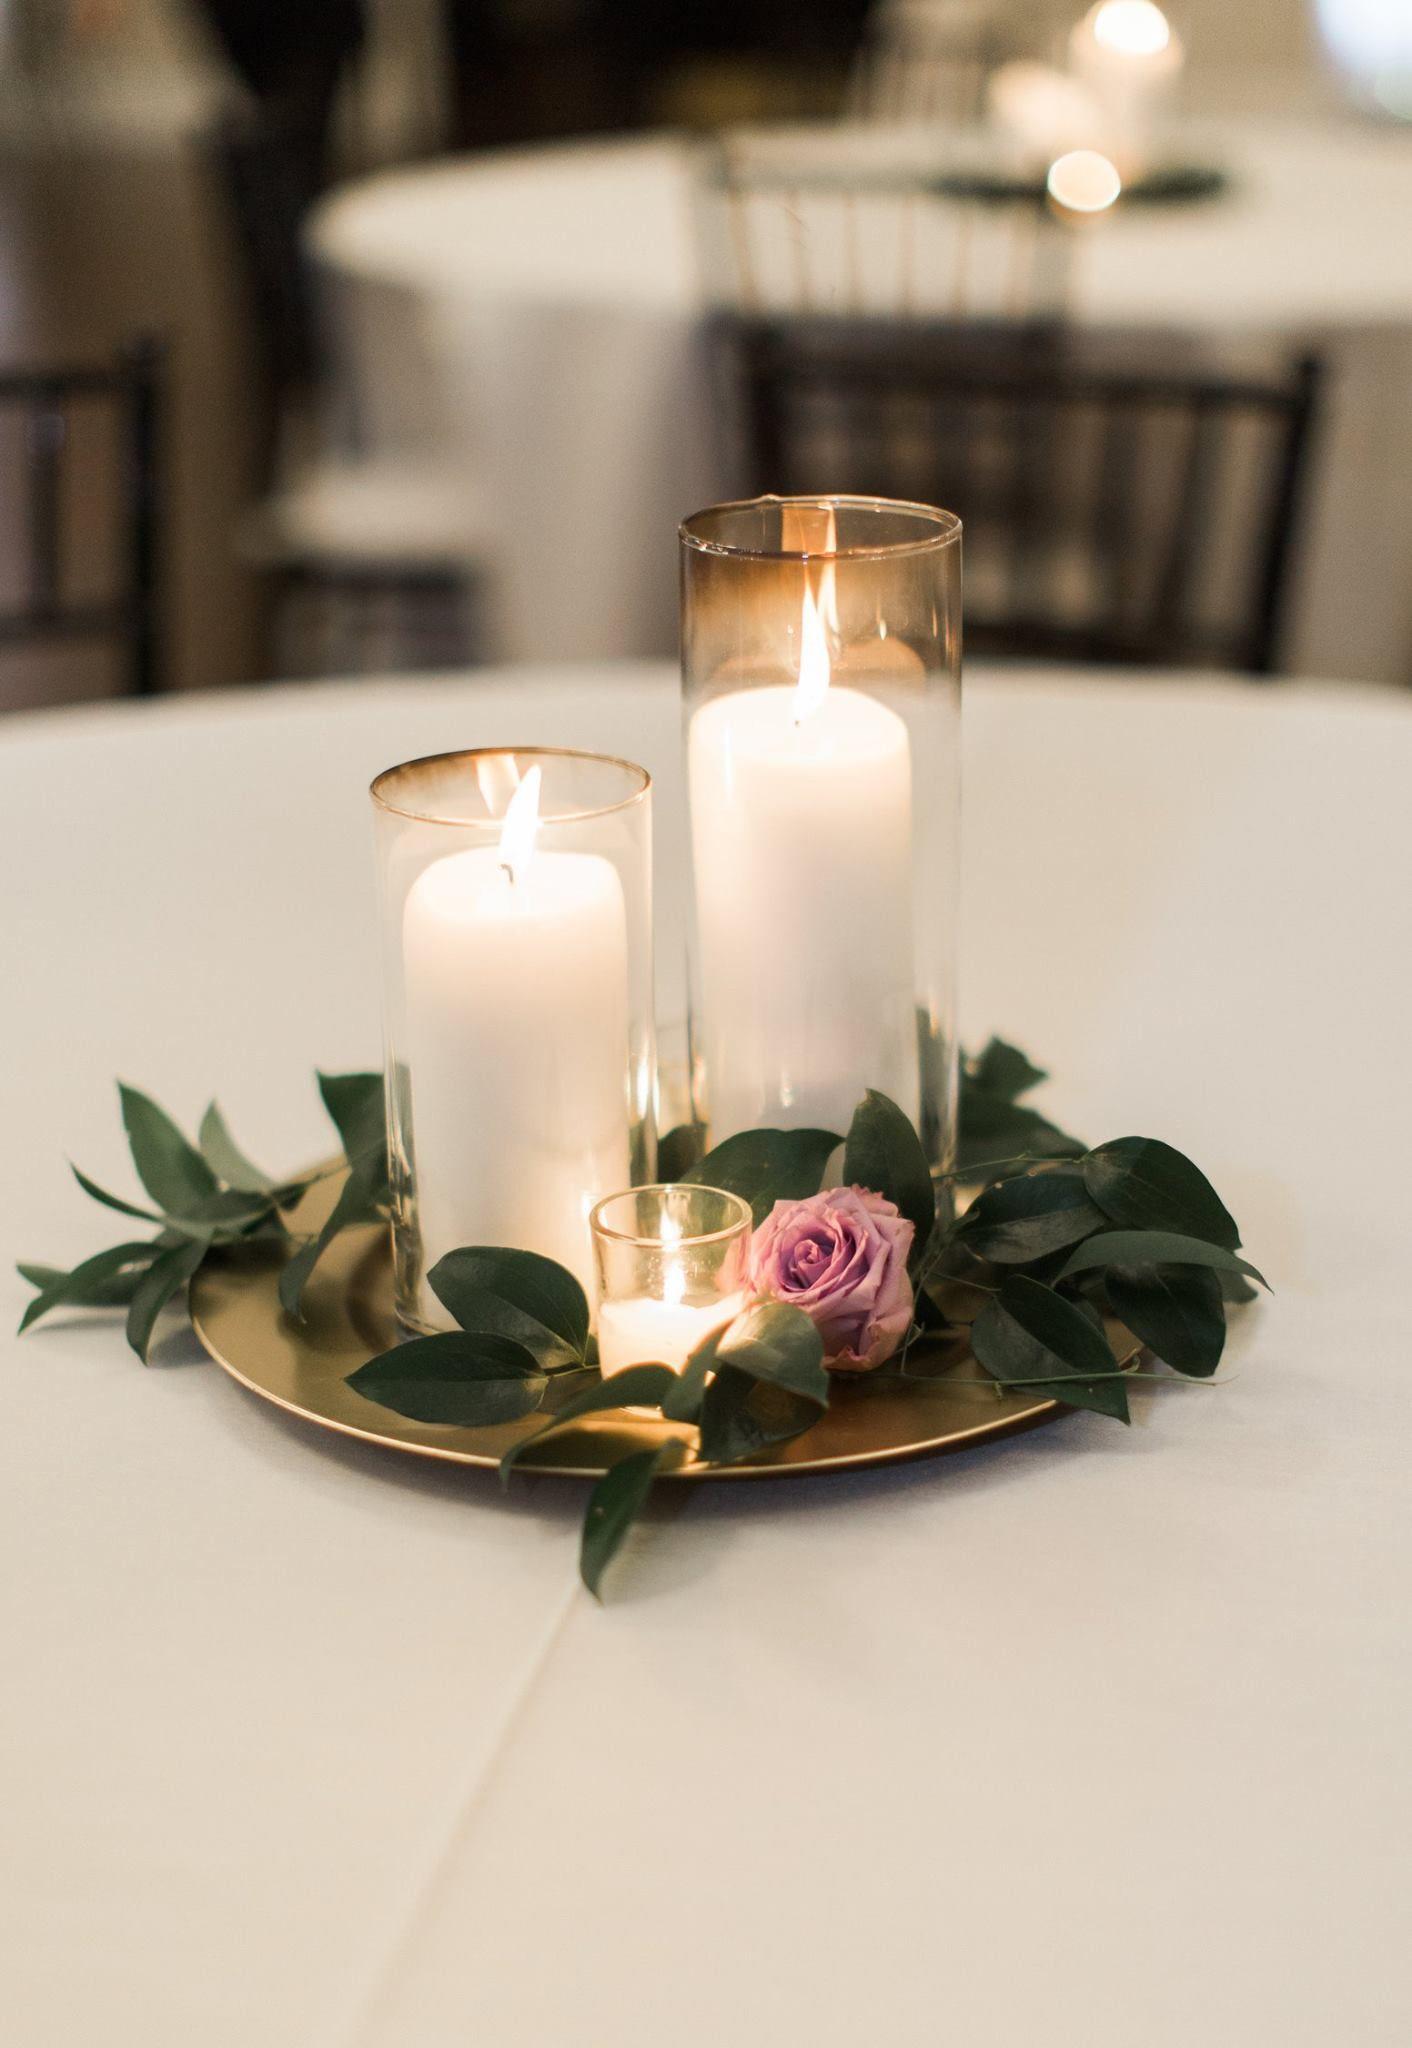 Candle Simple Wedding Reception Table Decorations Ideas Addicfashion